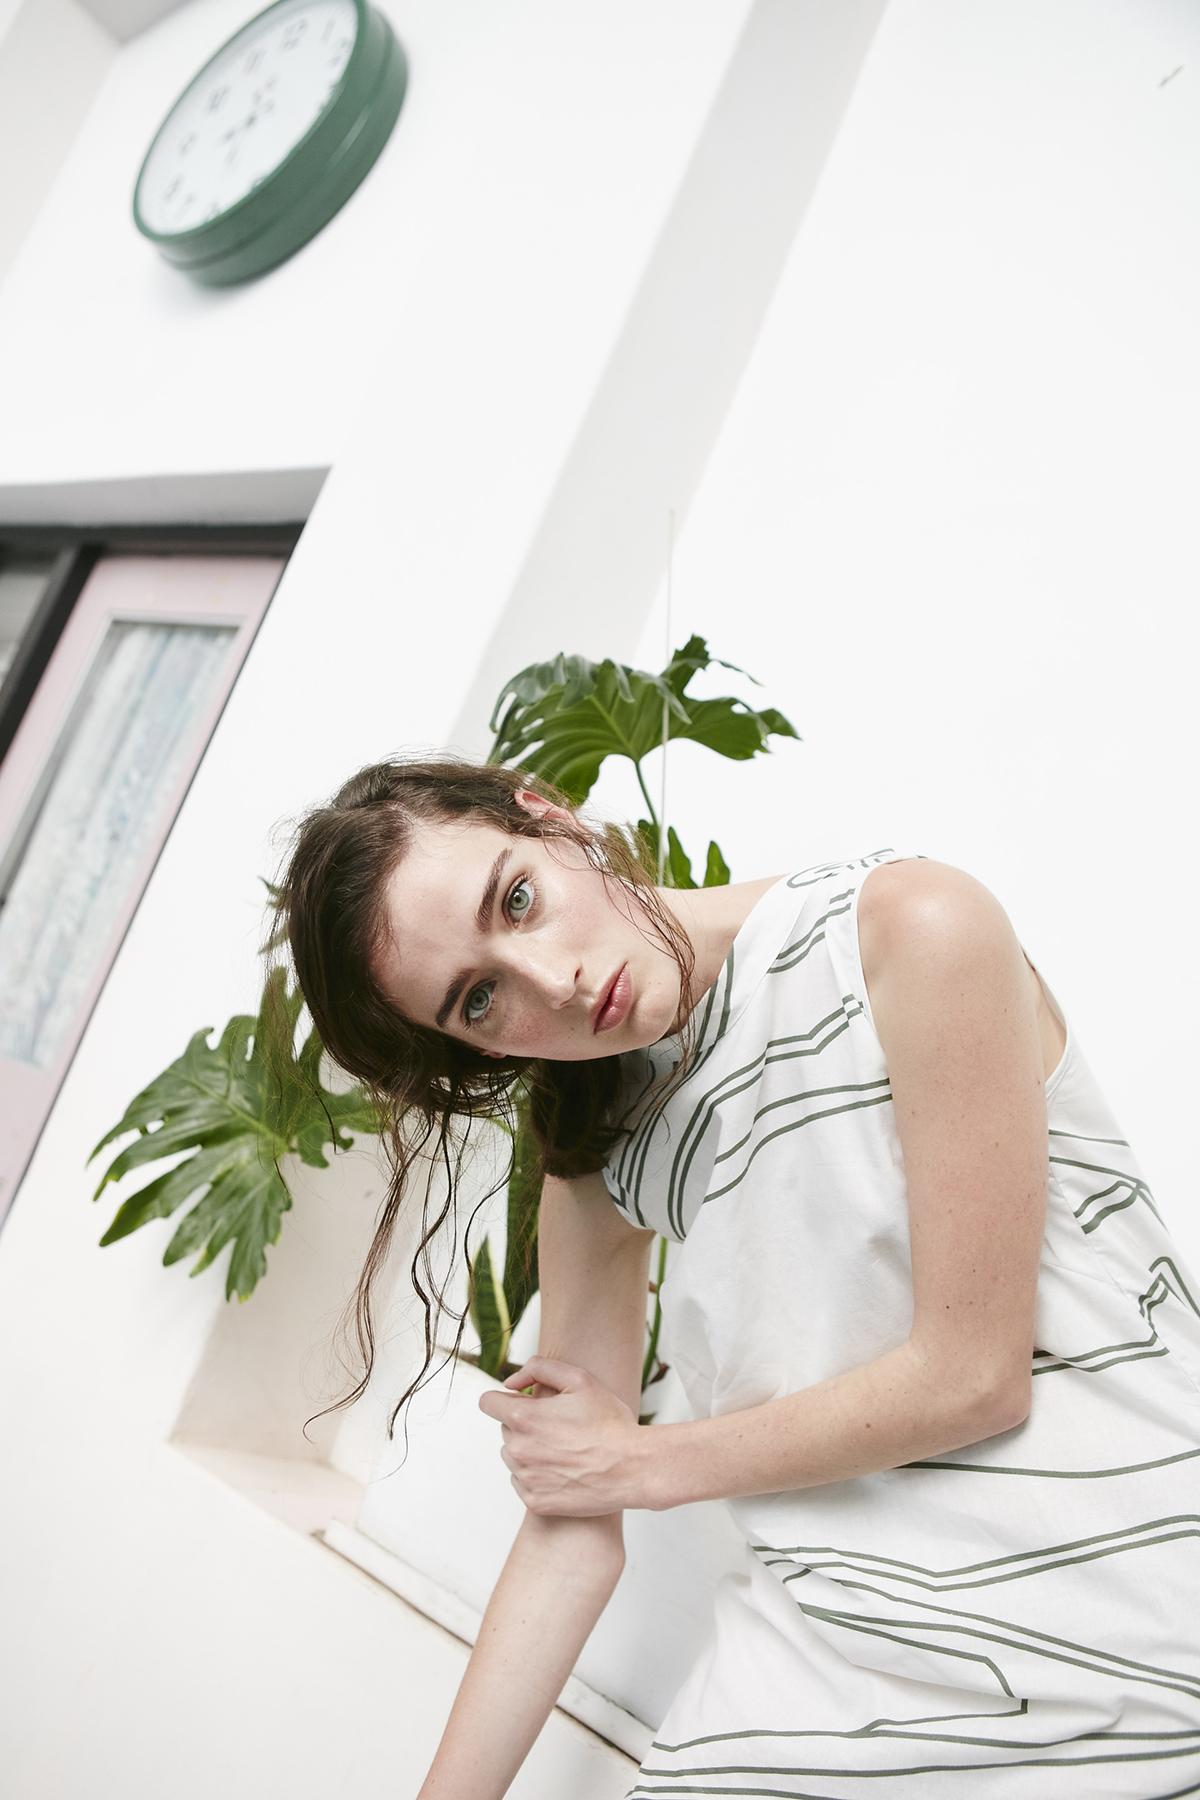 Margot Molyneux - Colour Field S/S16 - 5